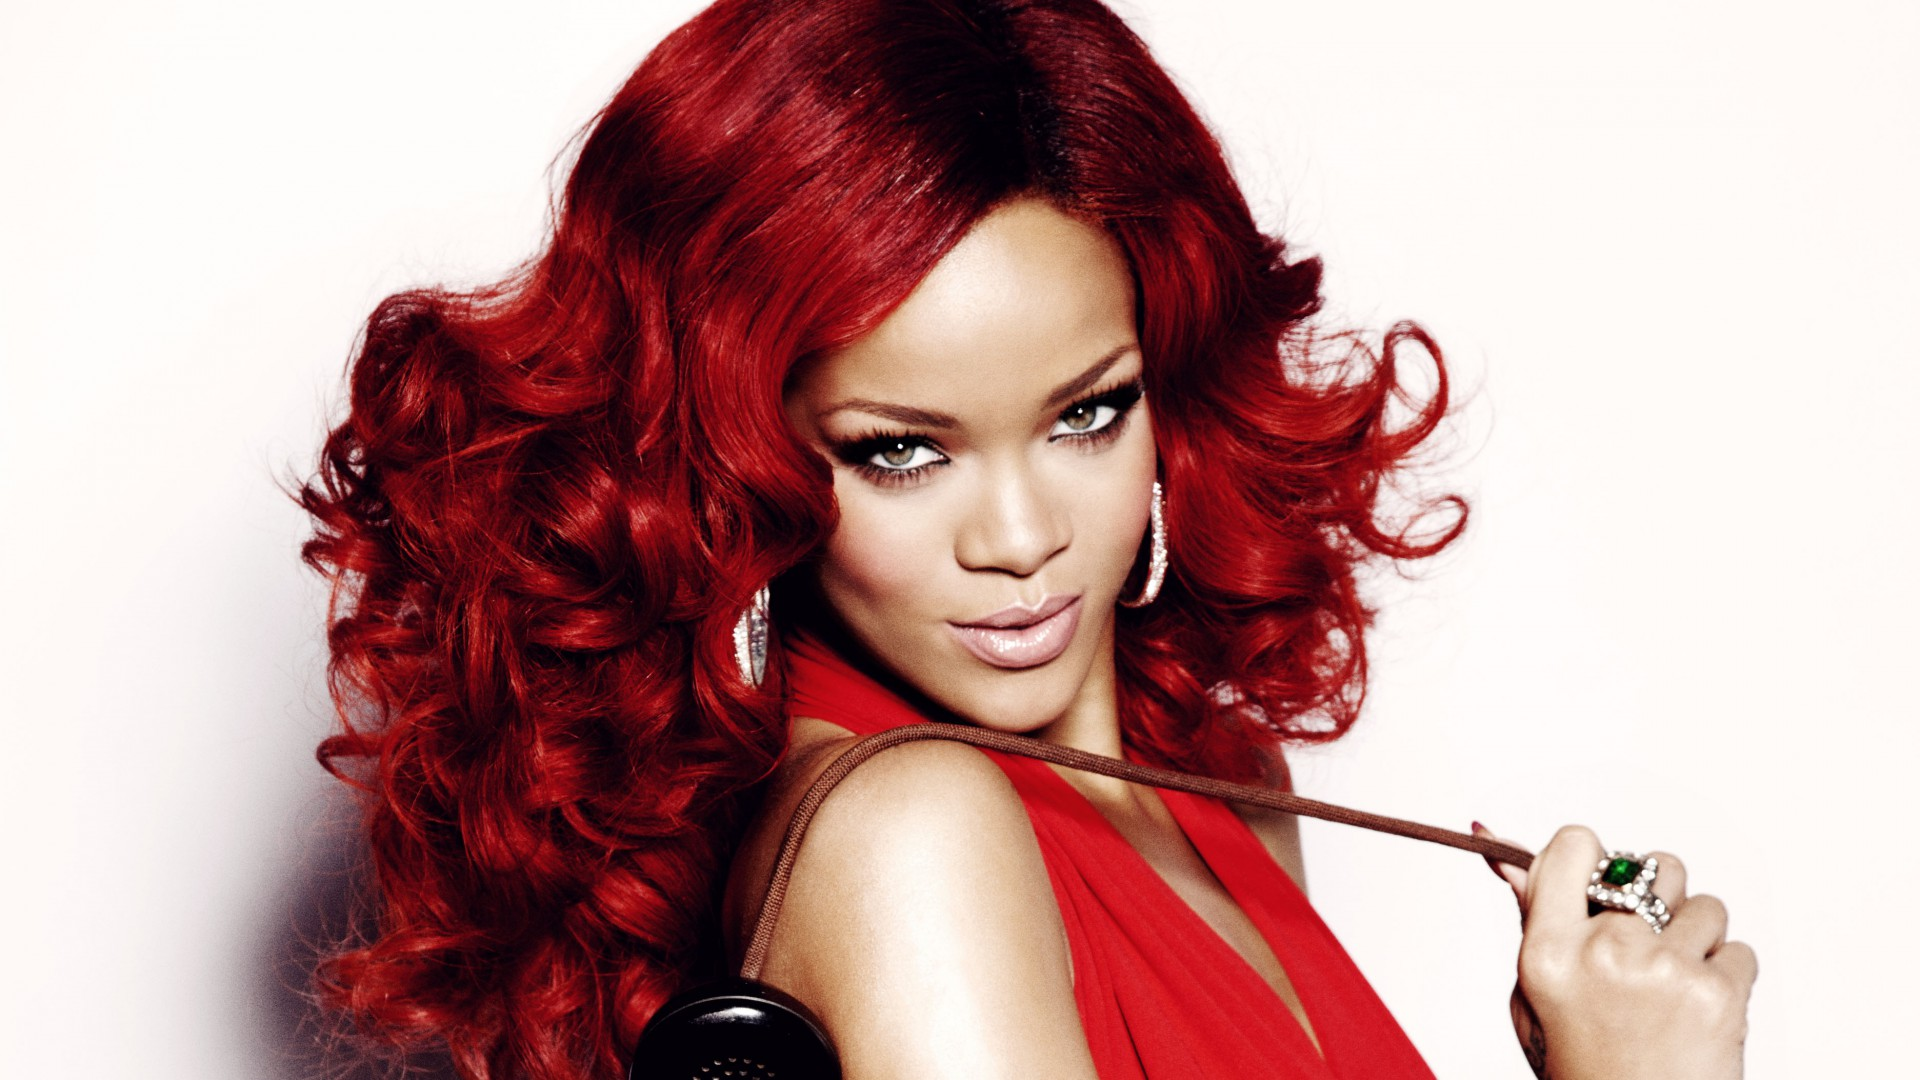 Music celebrity pics